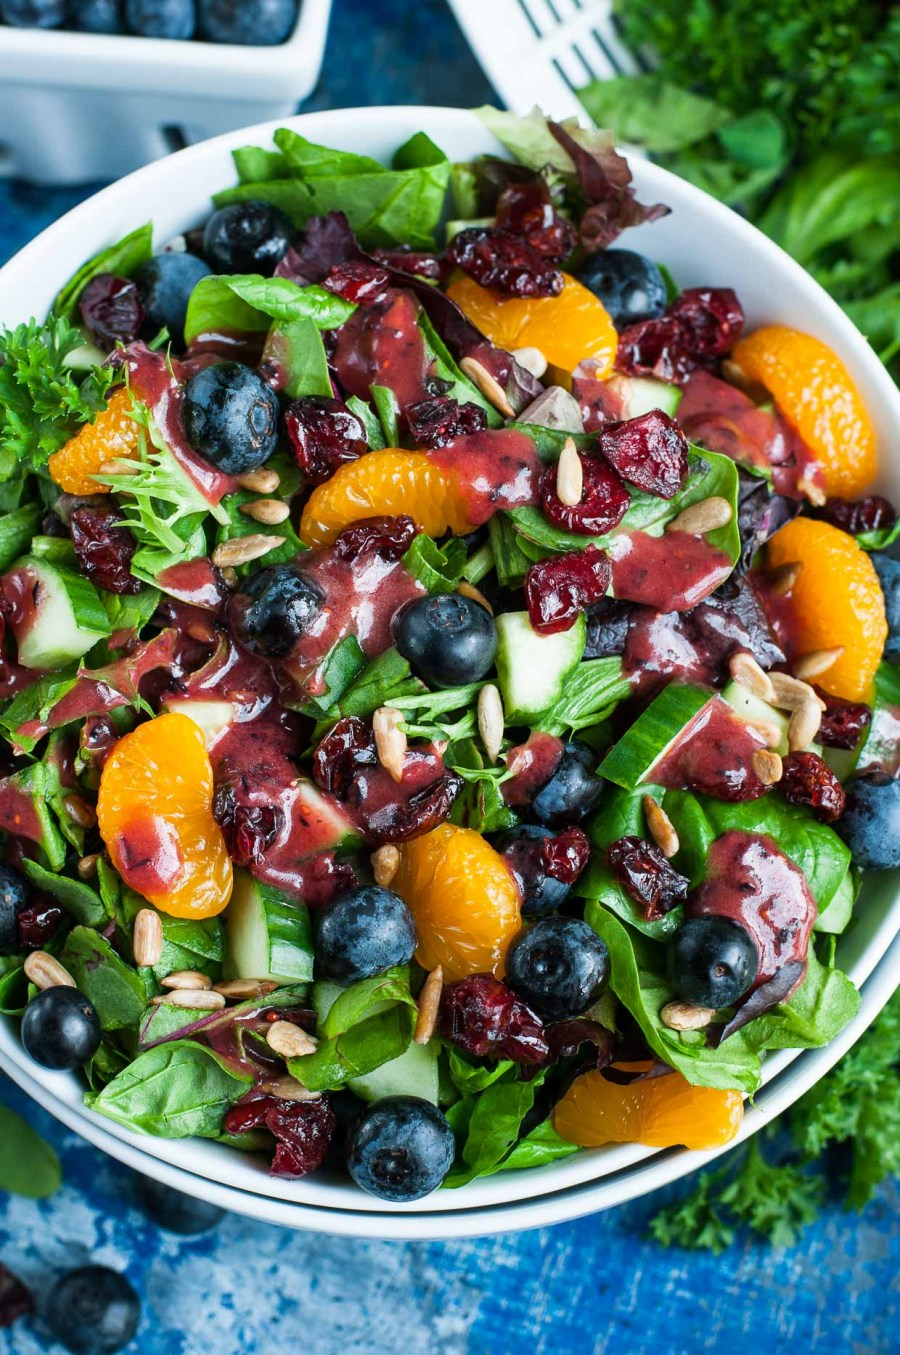 Balsamic Blueberry Salad Dressing on Salad